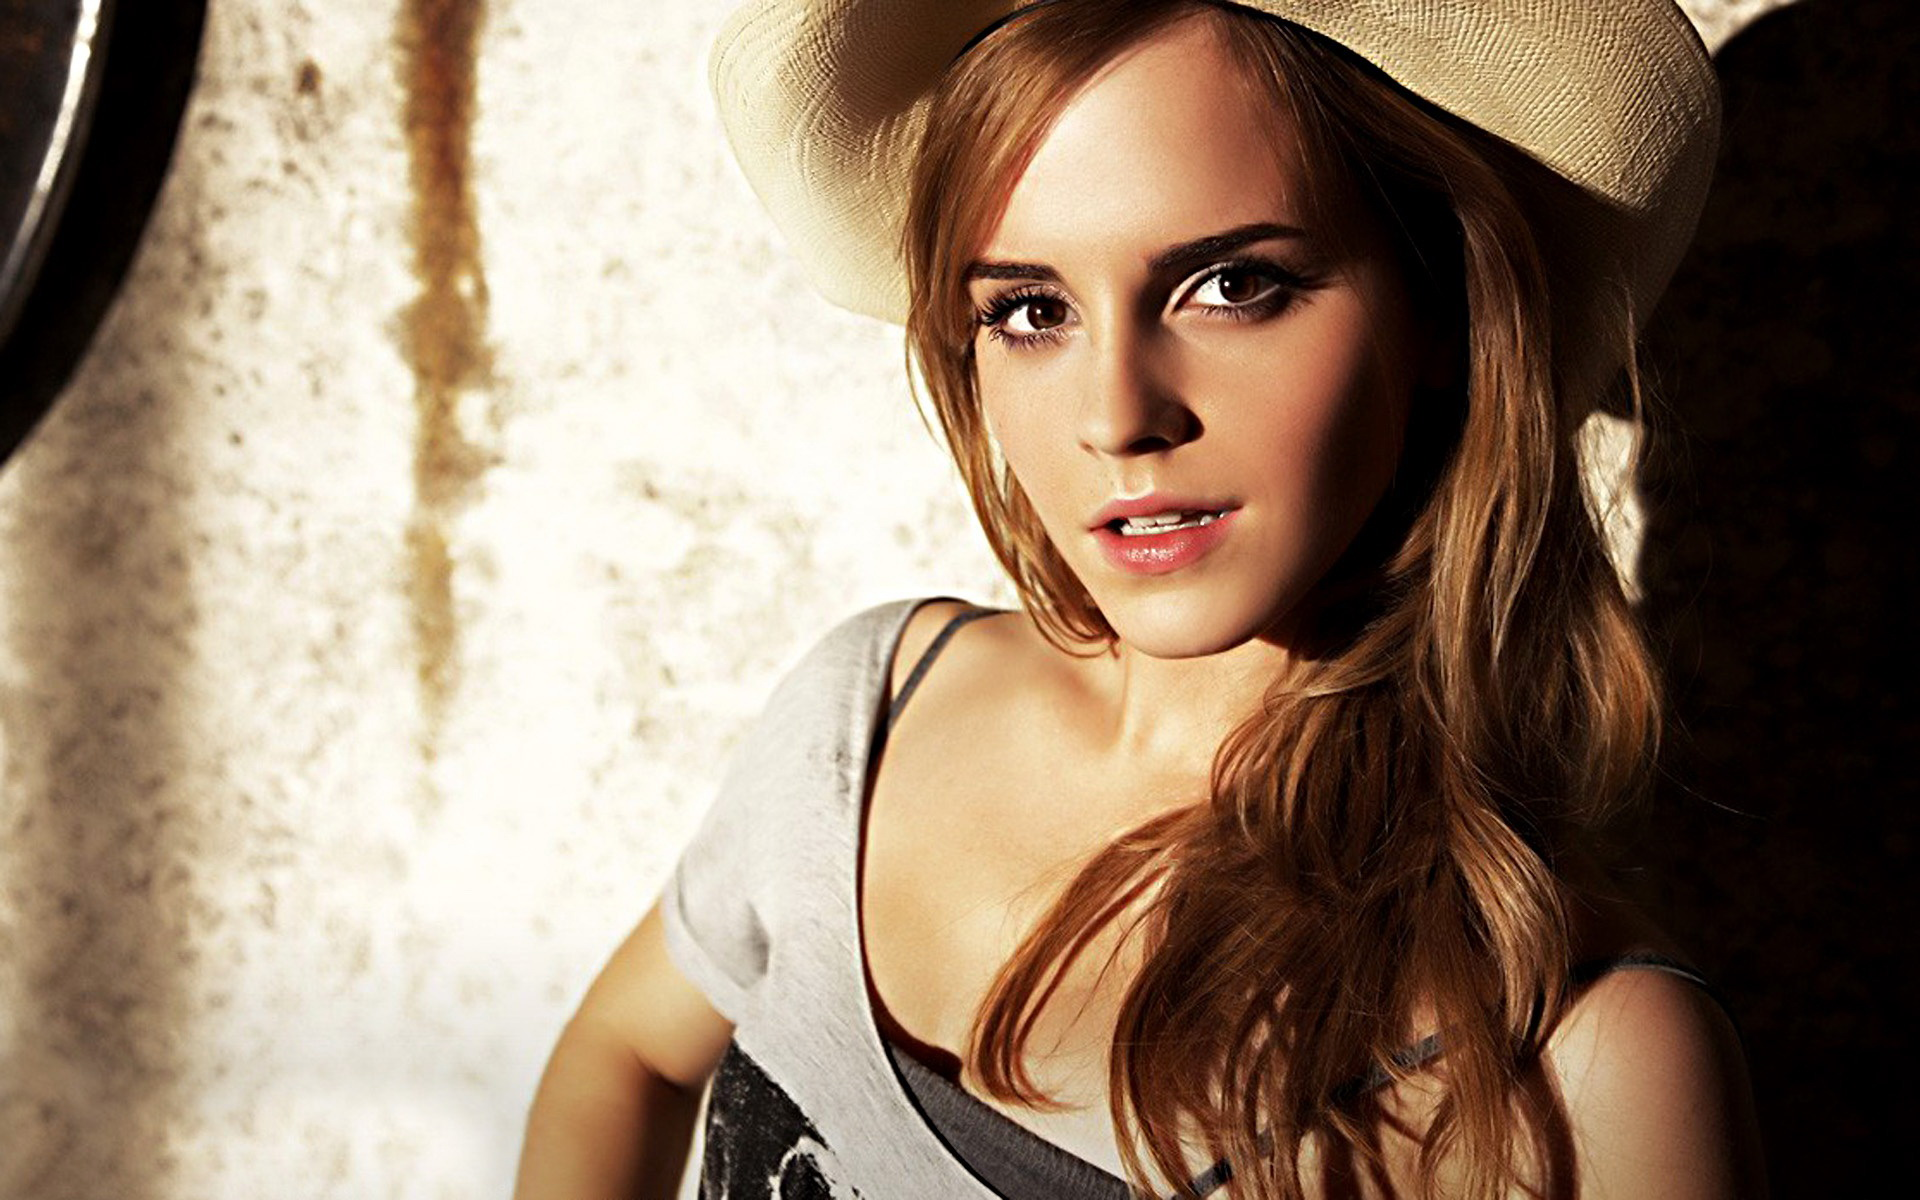 Emma Watson Wide Exclusive HD Wallpapers 4125 1920x1200